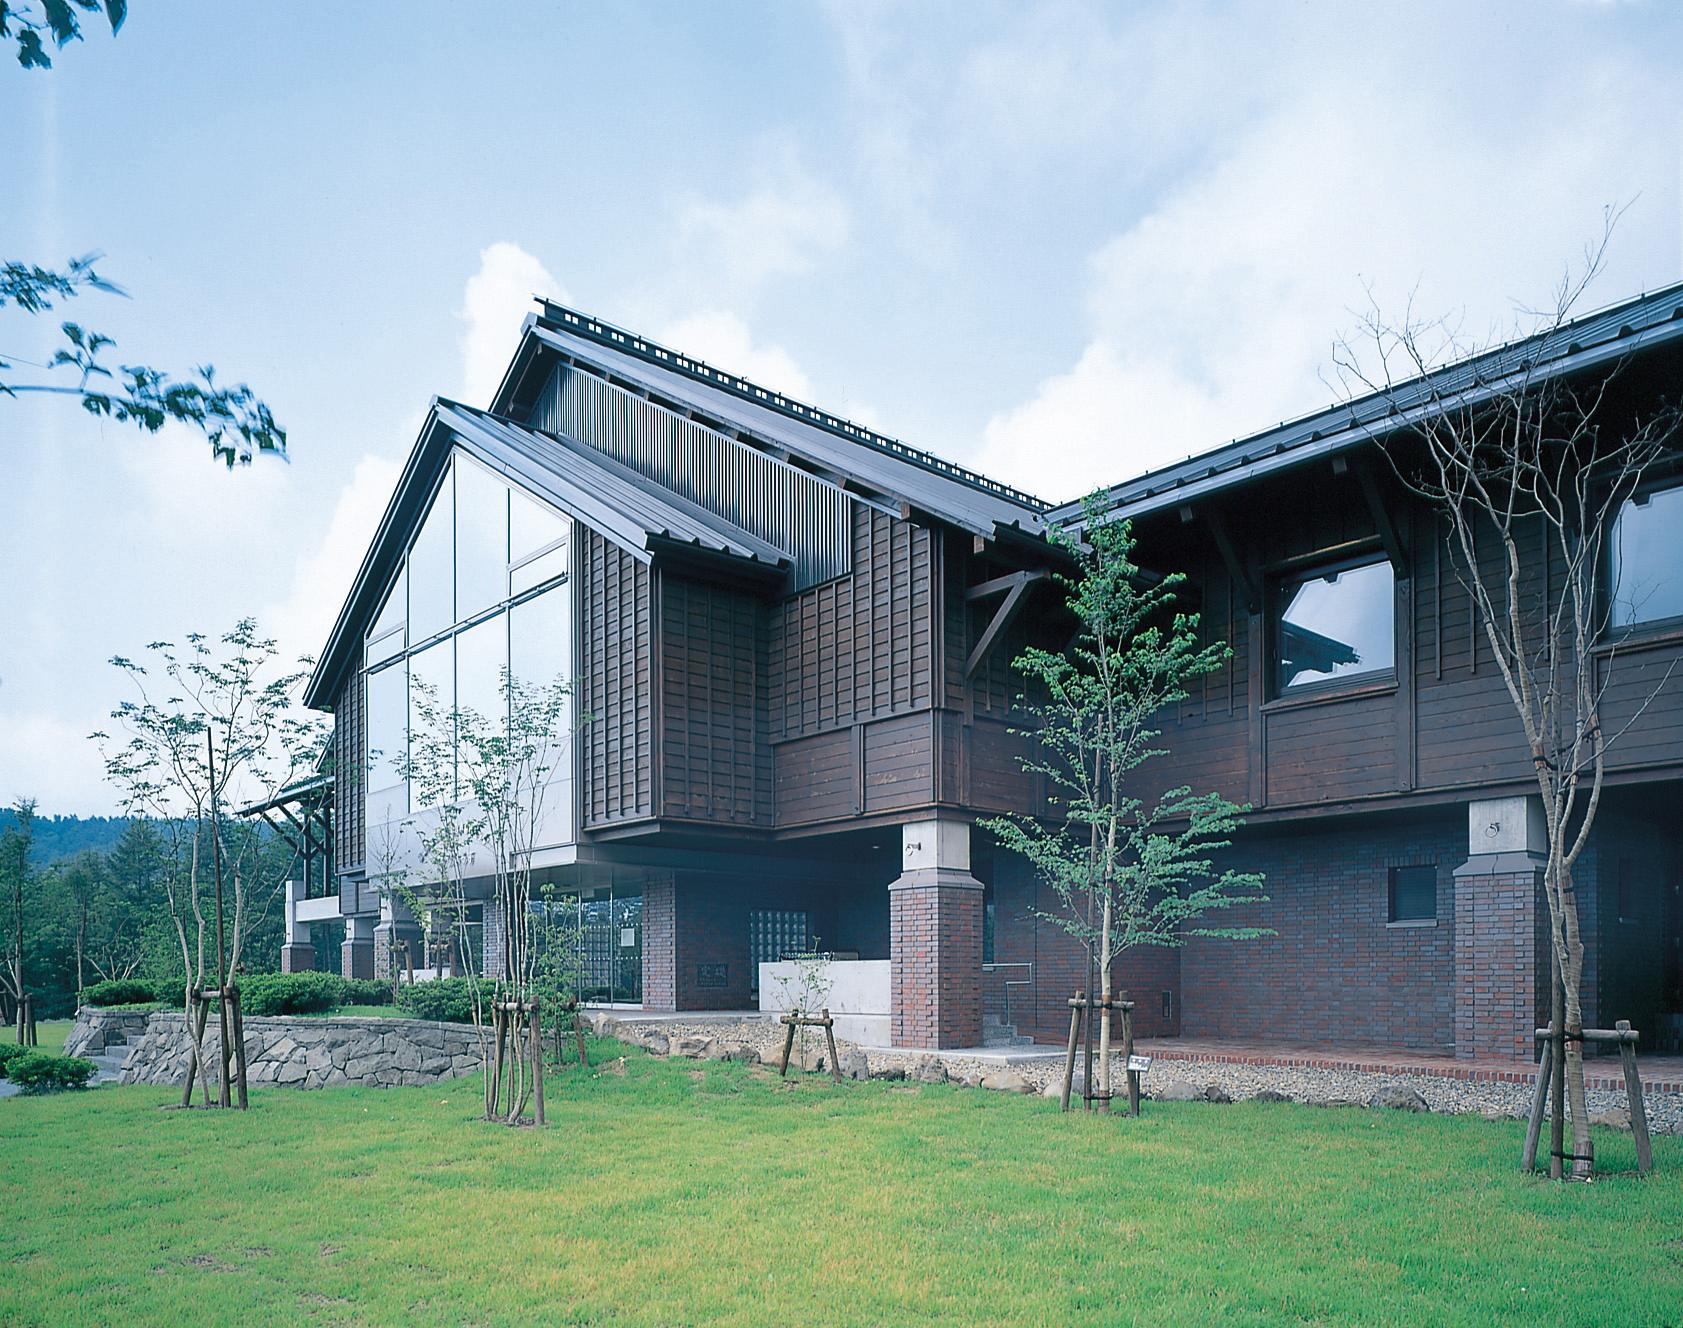 No.150128 ことりはうす(宮城県蔵王野鳥の森自然観察センター)